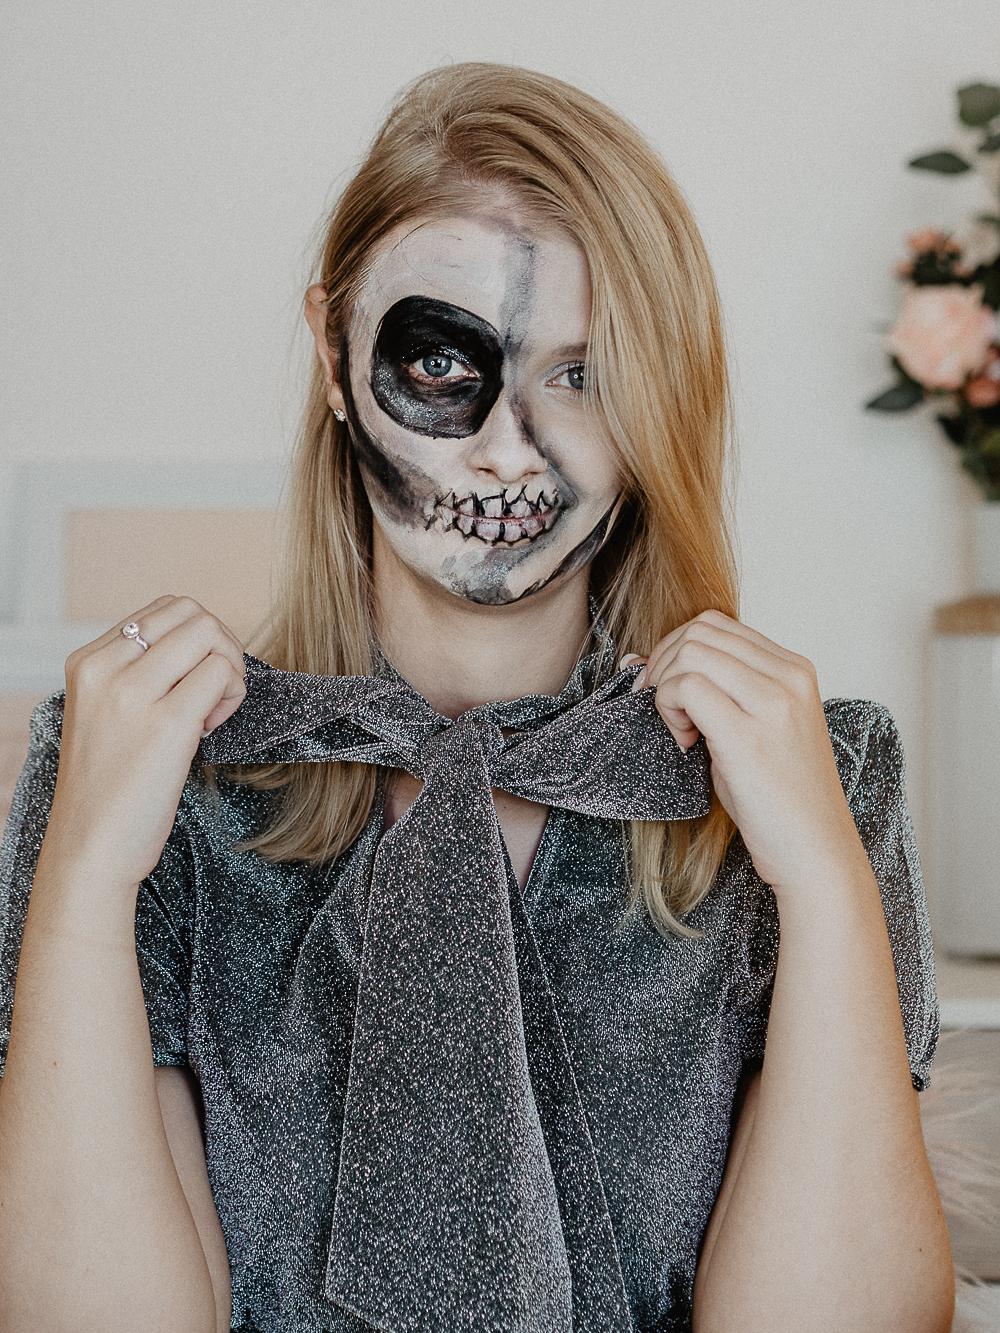 Halloween Schminke Deutsch.Half Skull Halloween Makup Tutorial Mit Drogerieprodukten Halloween Schminken Einfach Anleitung Deutsch Besassique Beautyblog Muenchen 2 Von 7 Be Sassique